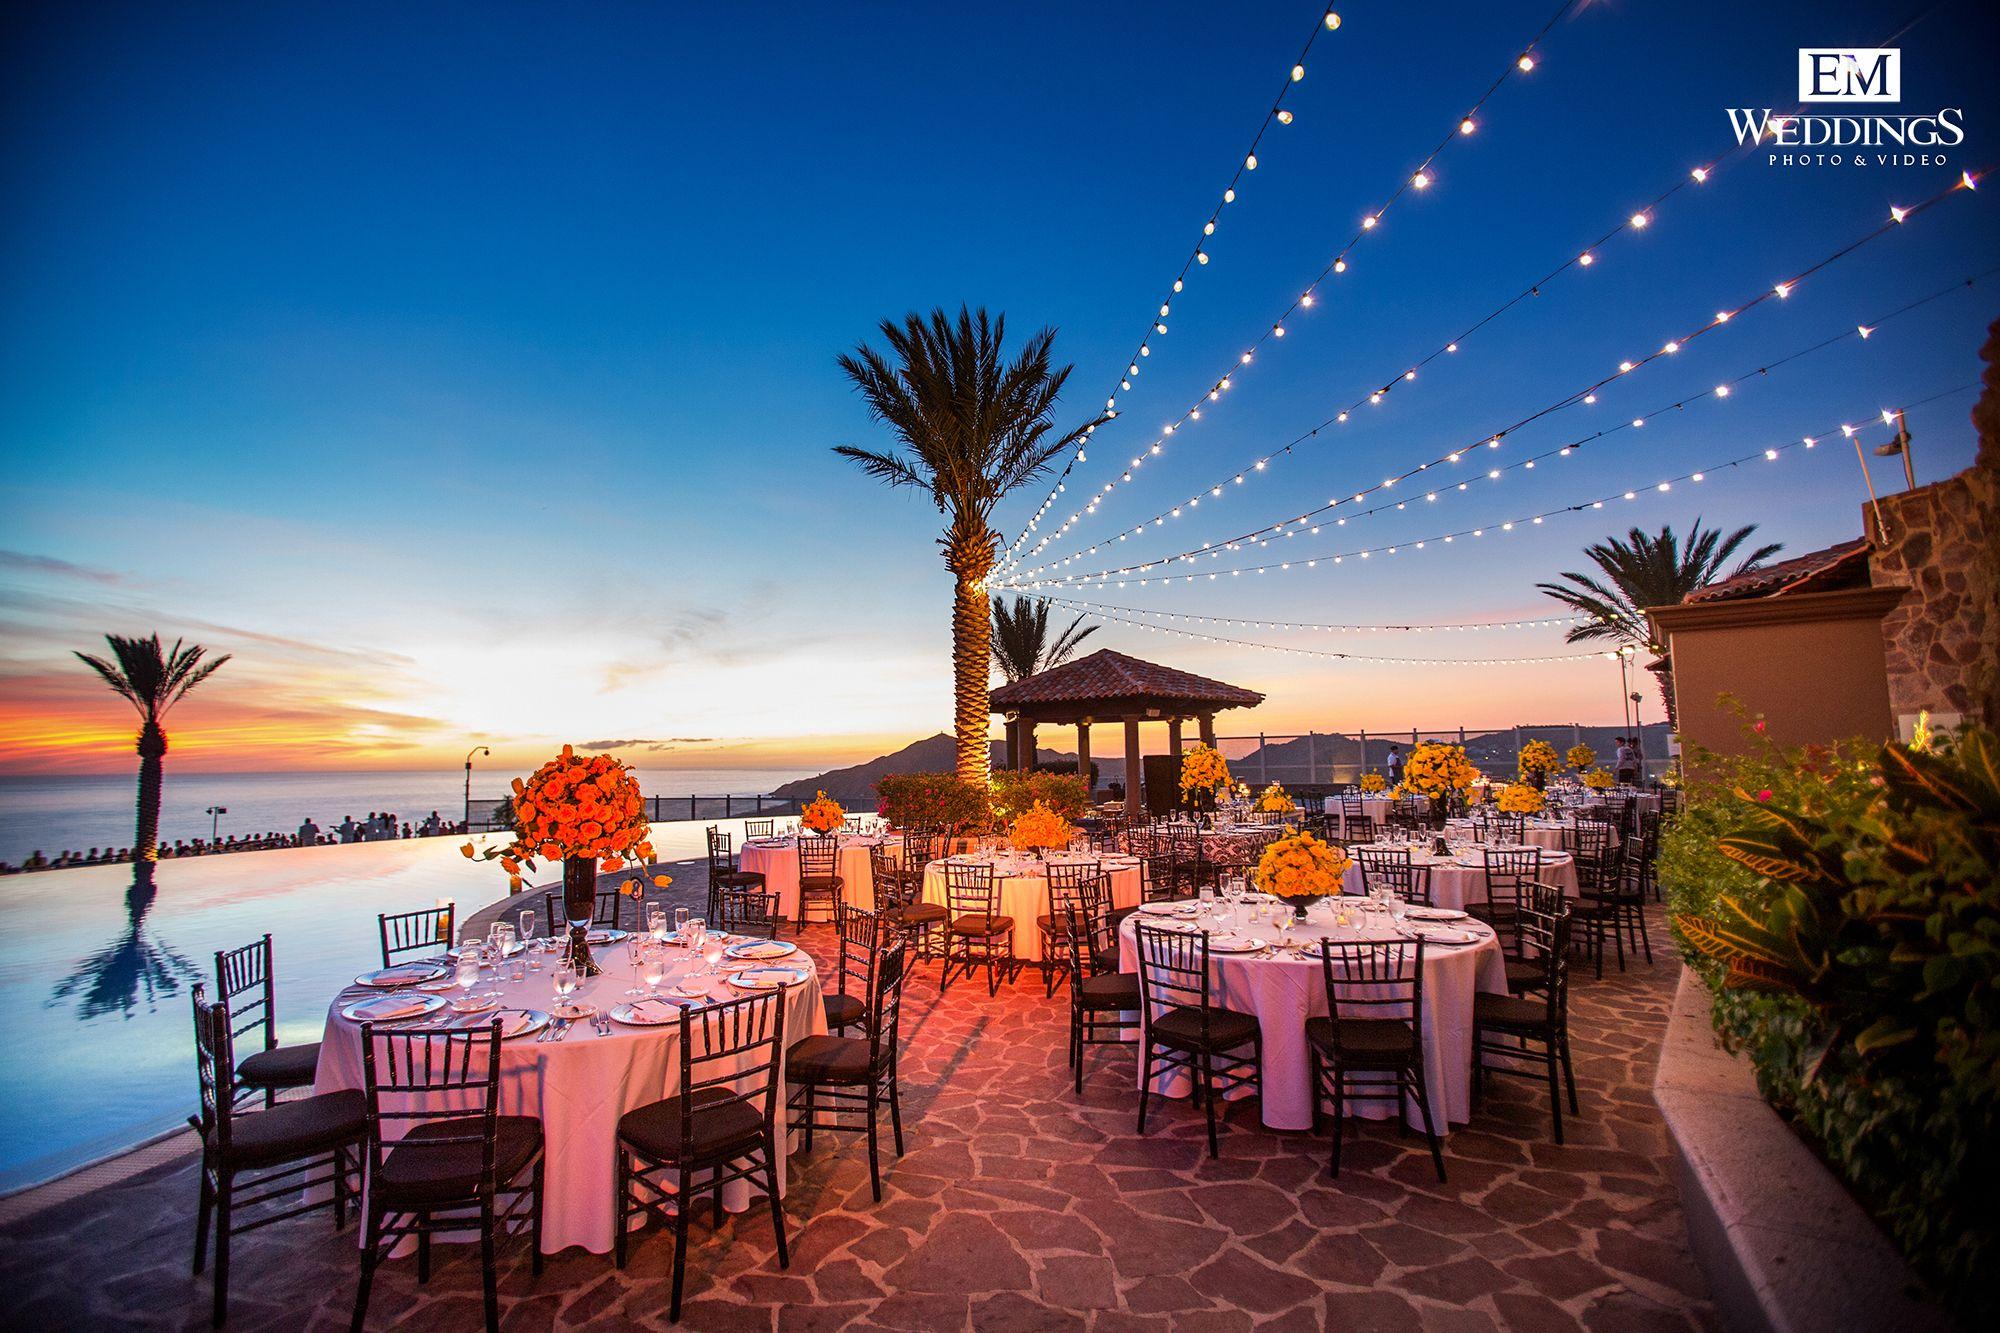 Wedding Decoration at Hotel Pueblo Bonito Sunset Beach